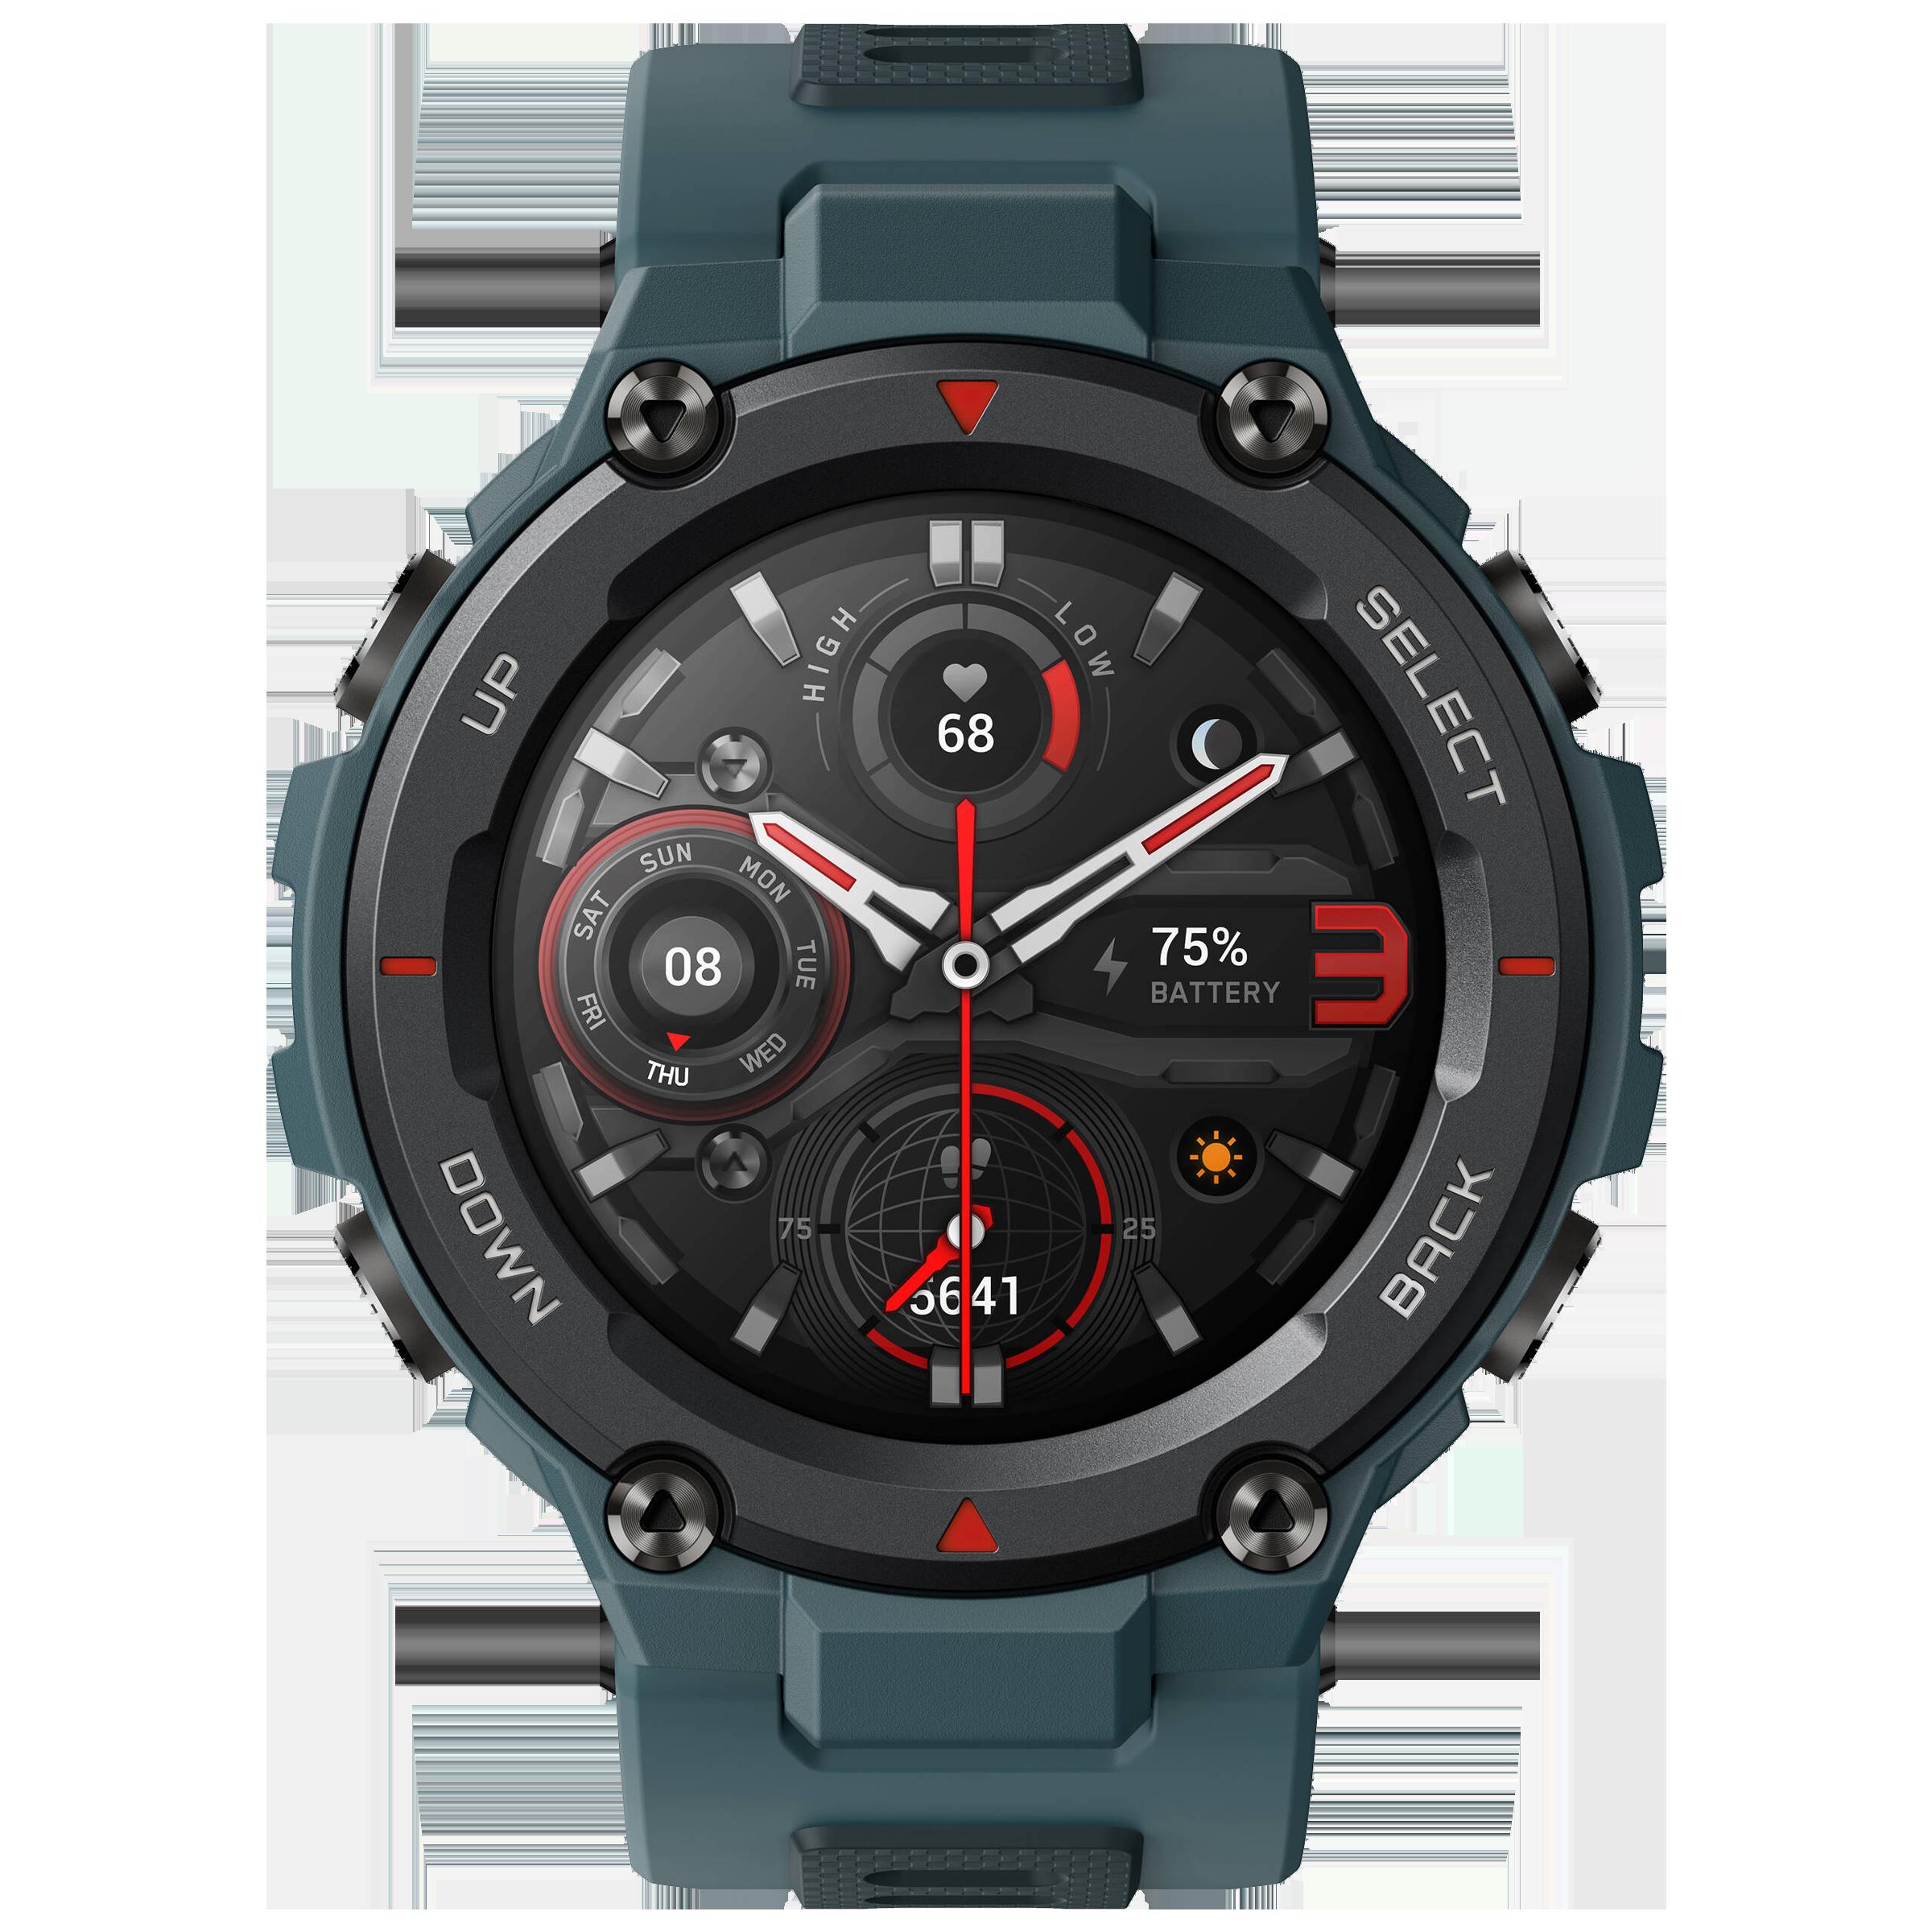 Amazfit T-Rex Pro Smart Watch (GPS, 33.02mm) (Blood-Oxygen Saturation Measurement, A2013, Steel Blue, Silicone Rubber Strap)